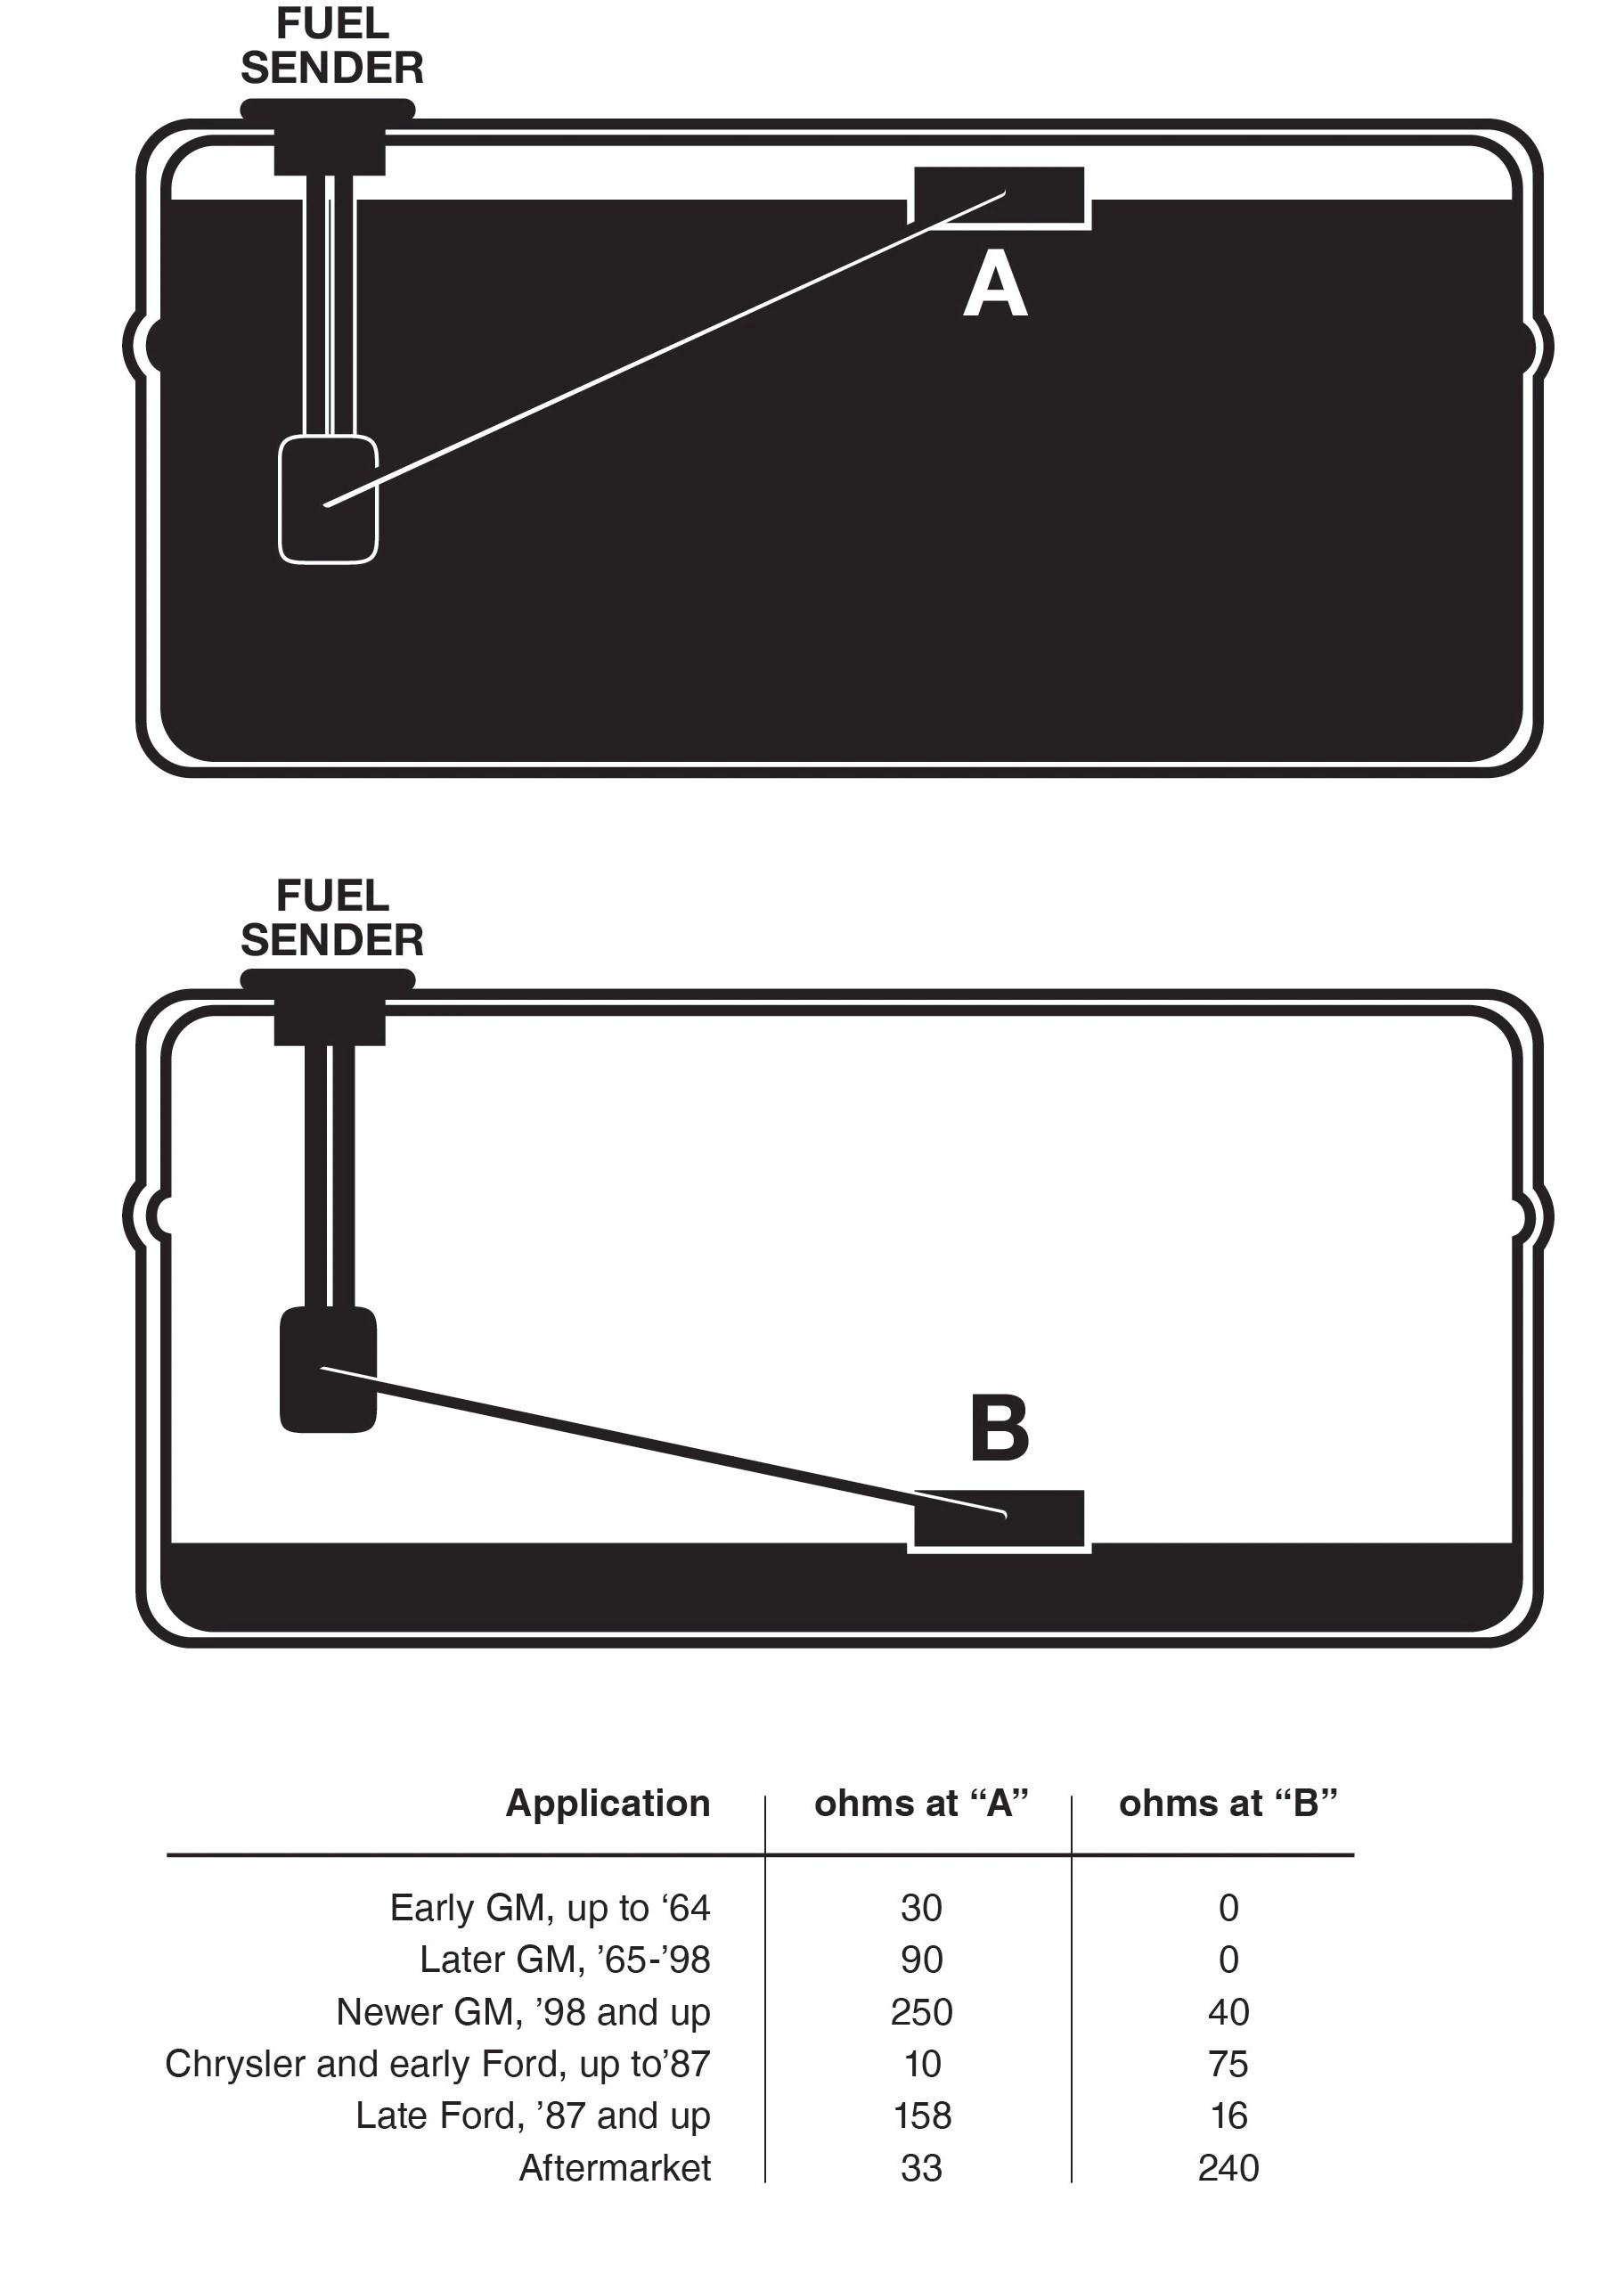 ezgo wiring diagram gas two way lighting switch st480 model identification